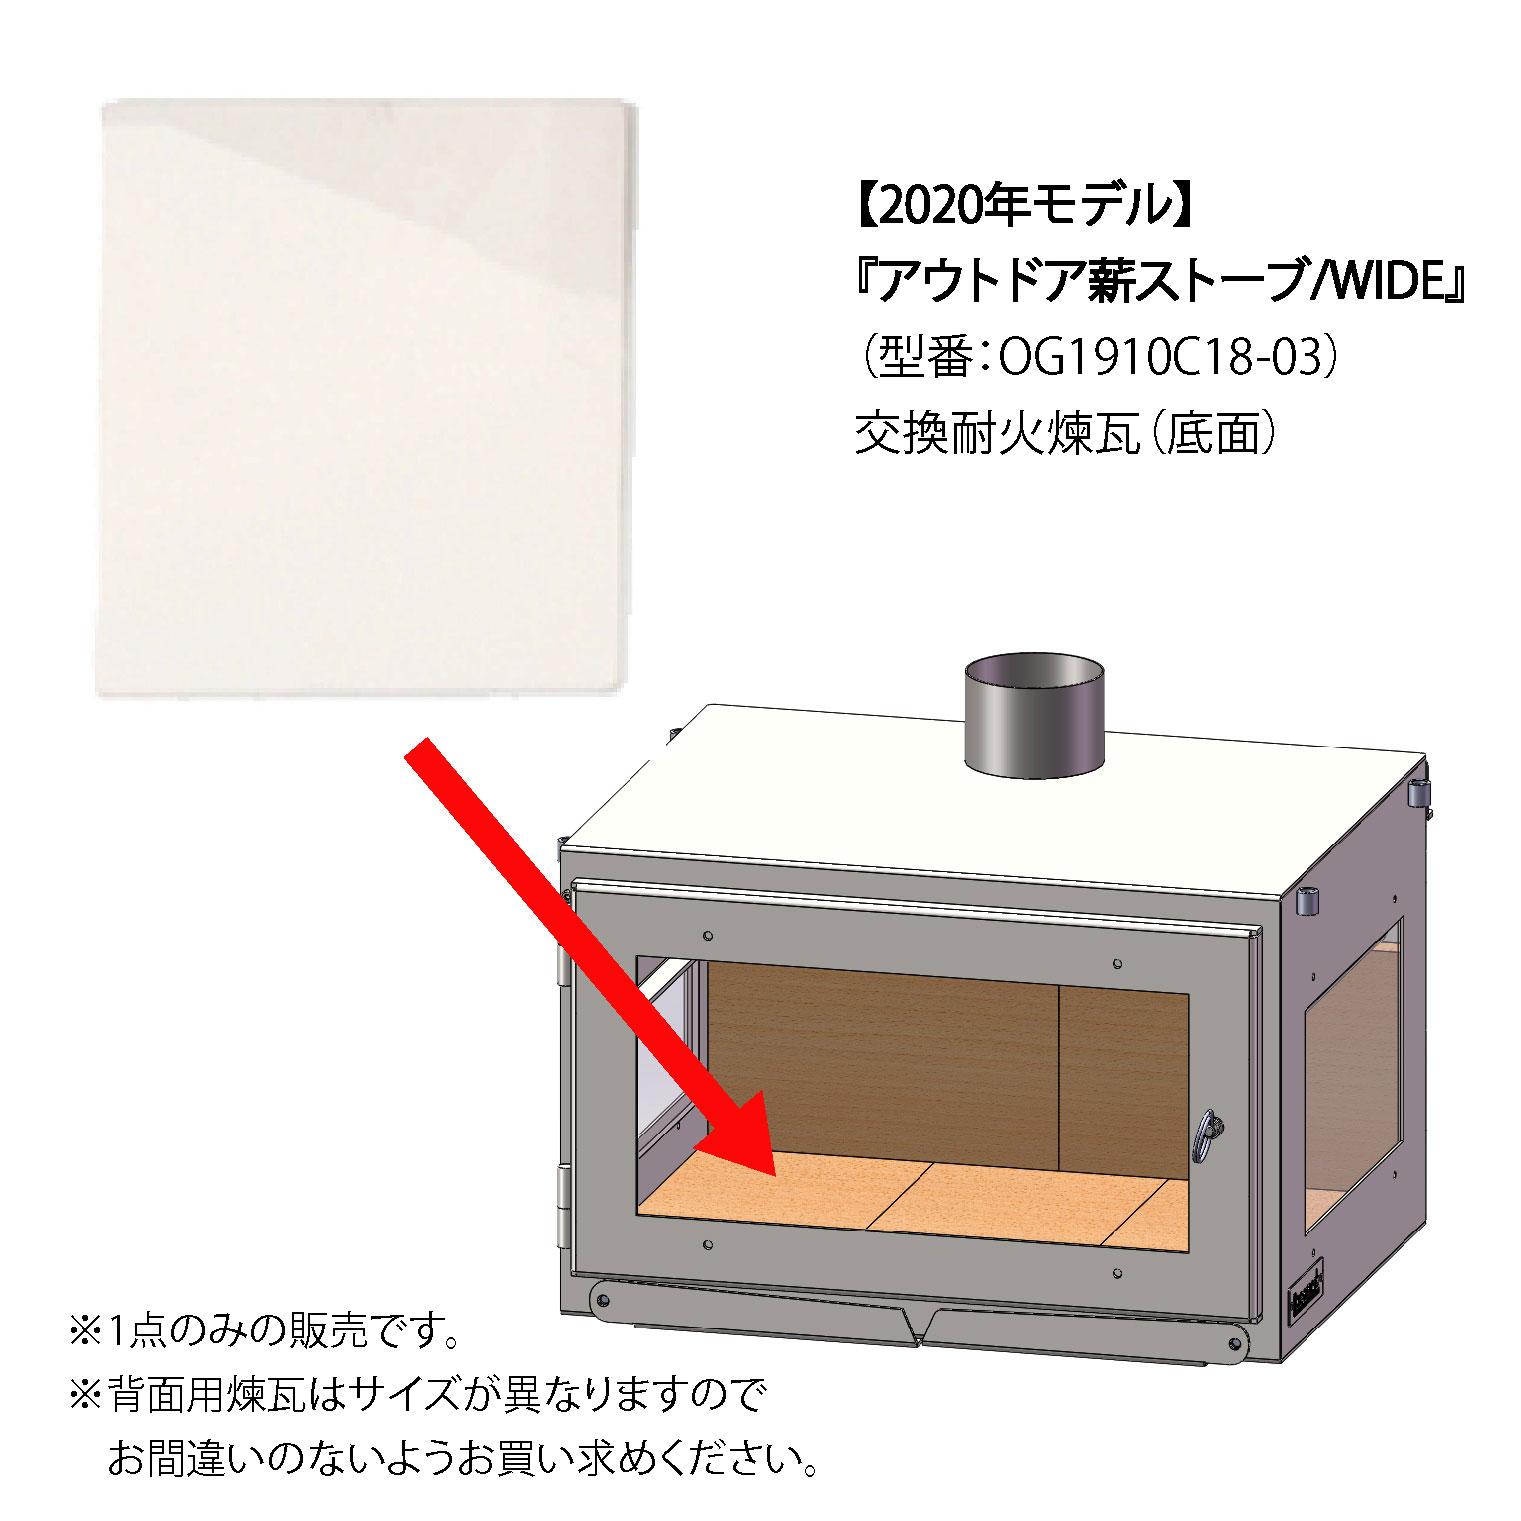 【12月上旬頃発送予定!】Locomo WIDE ストーブ用 耐火煉瓦 ( 底面 )